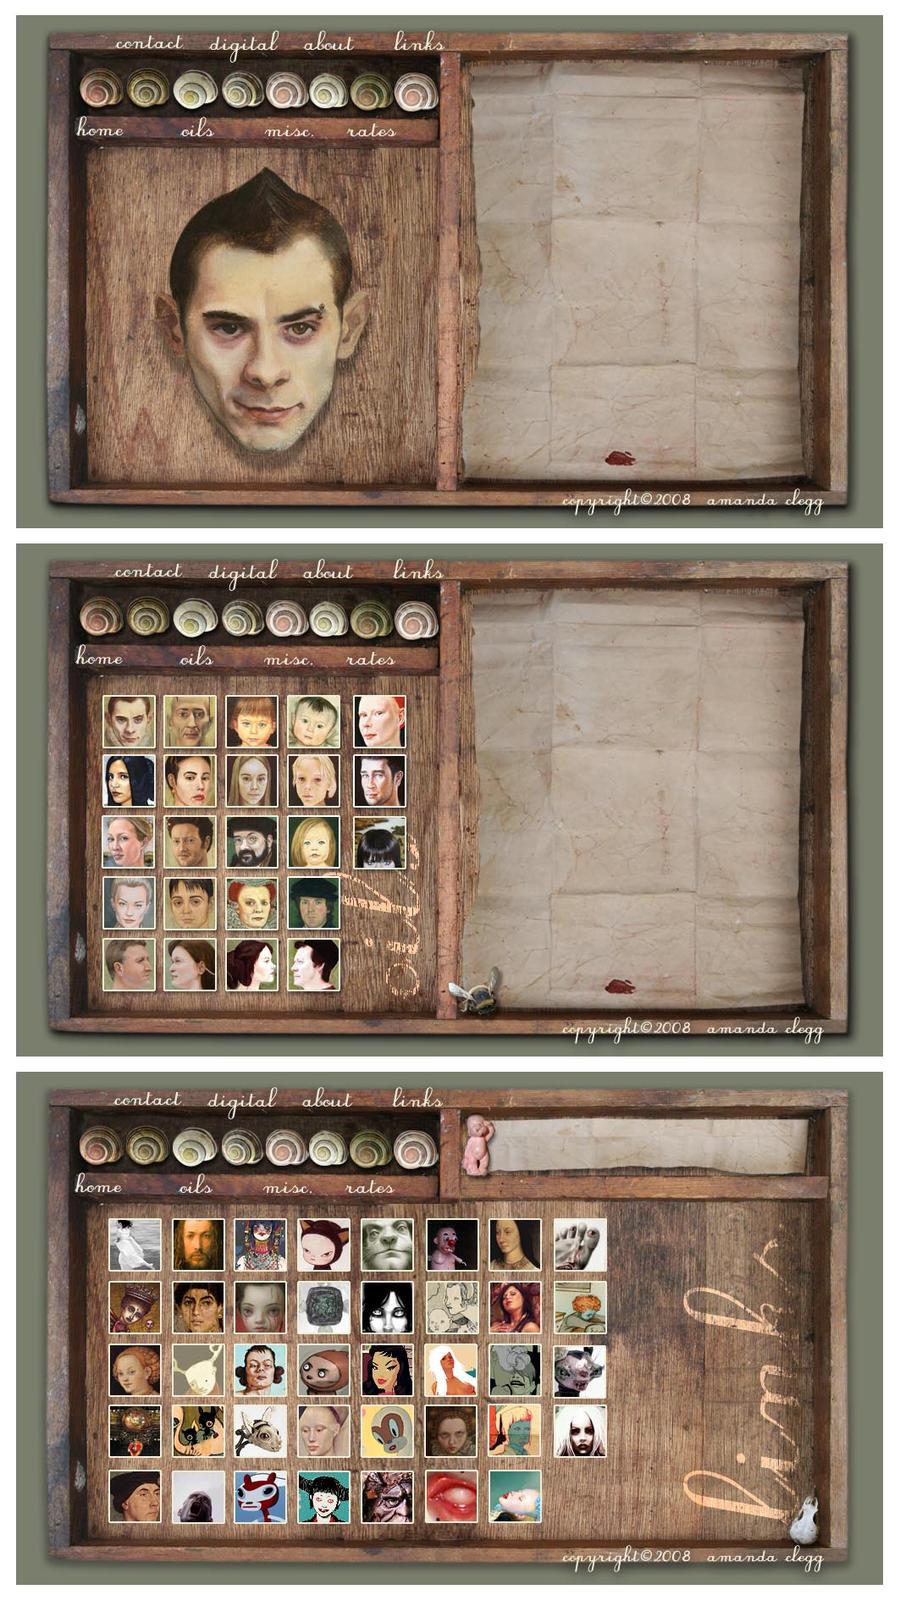 Portraits Website: in progress by enginemonkey